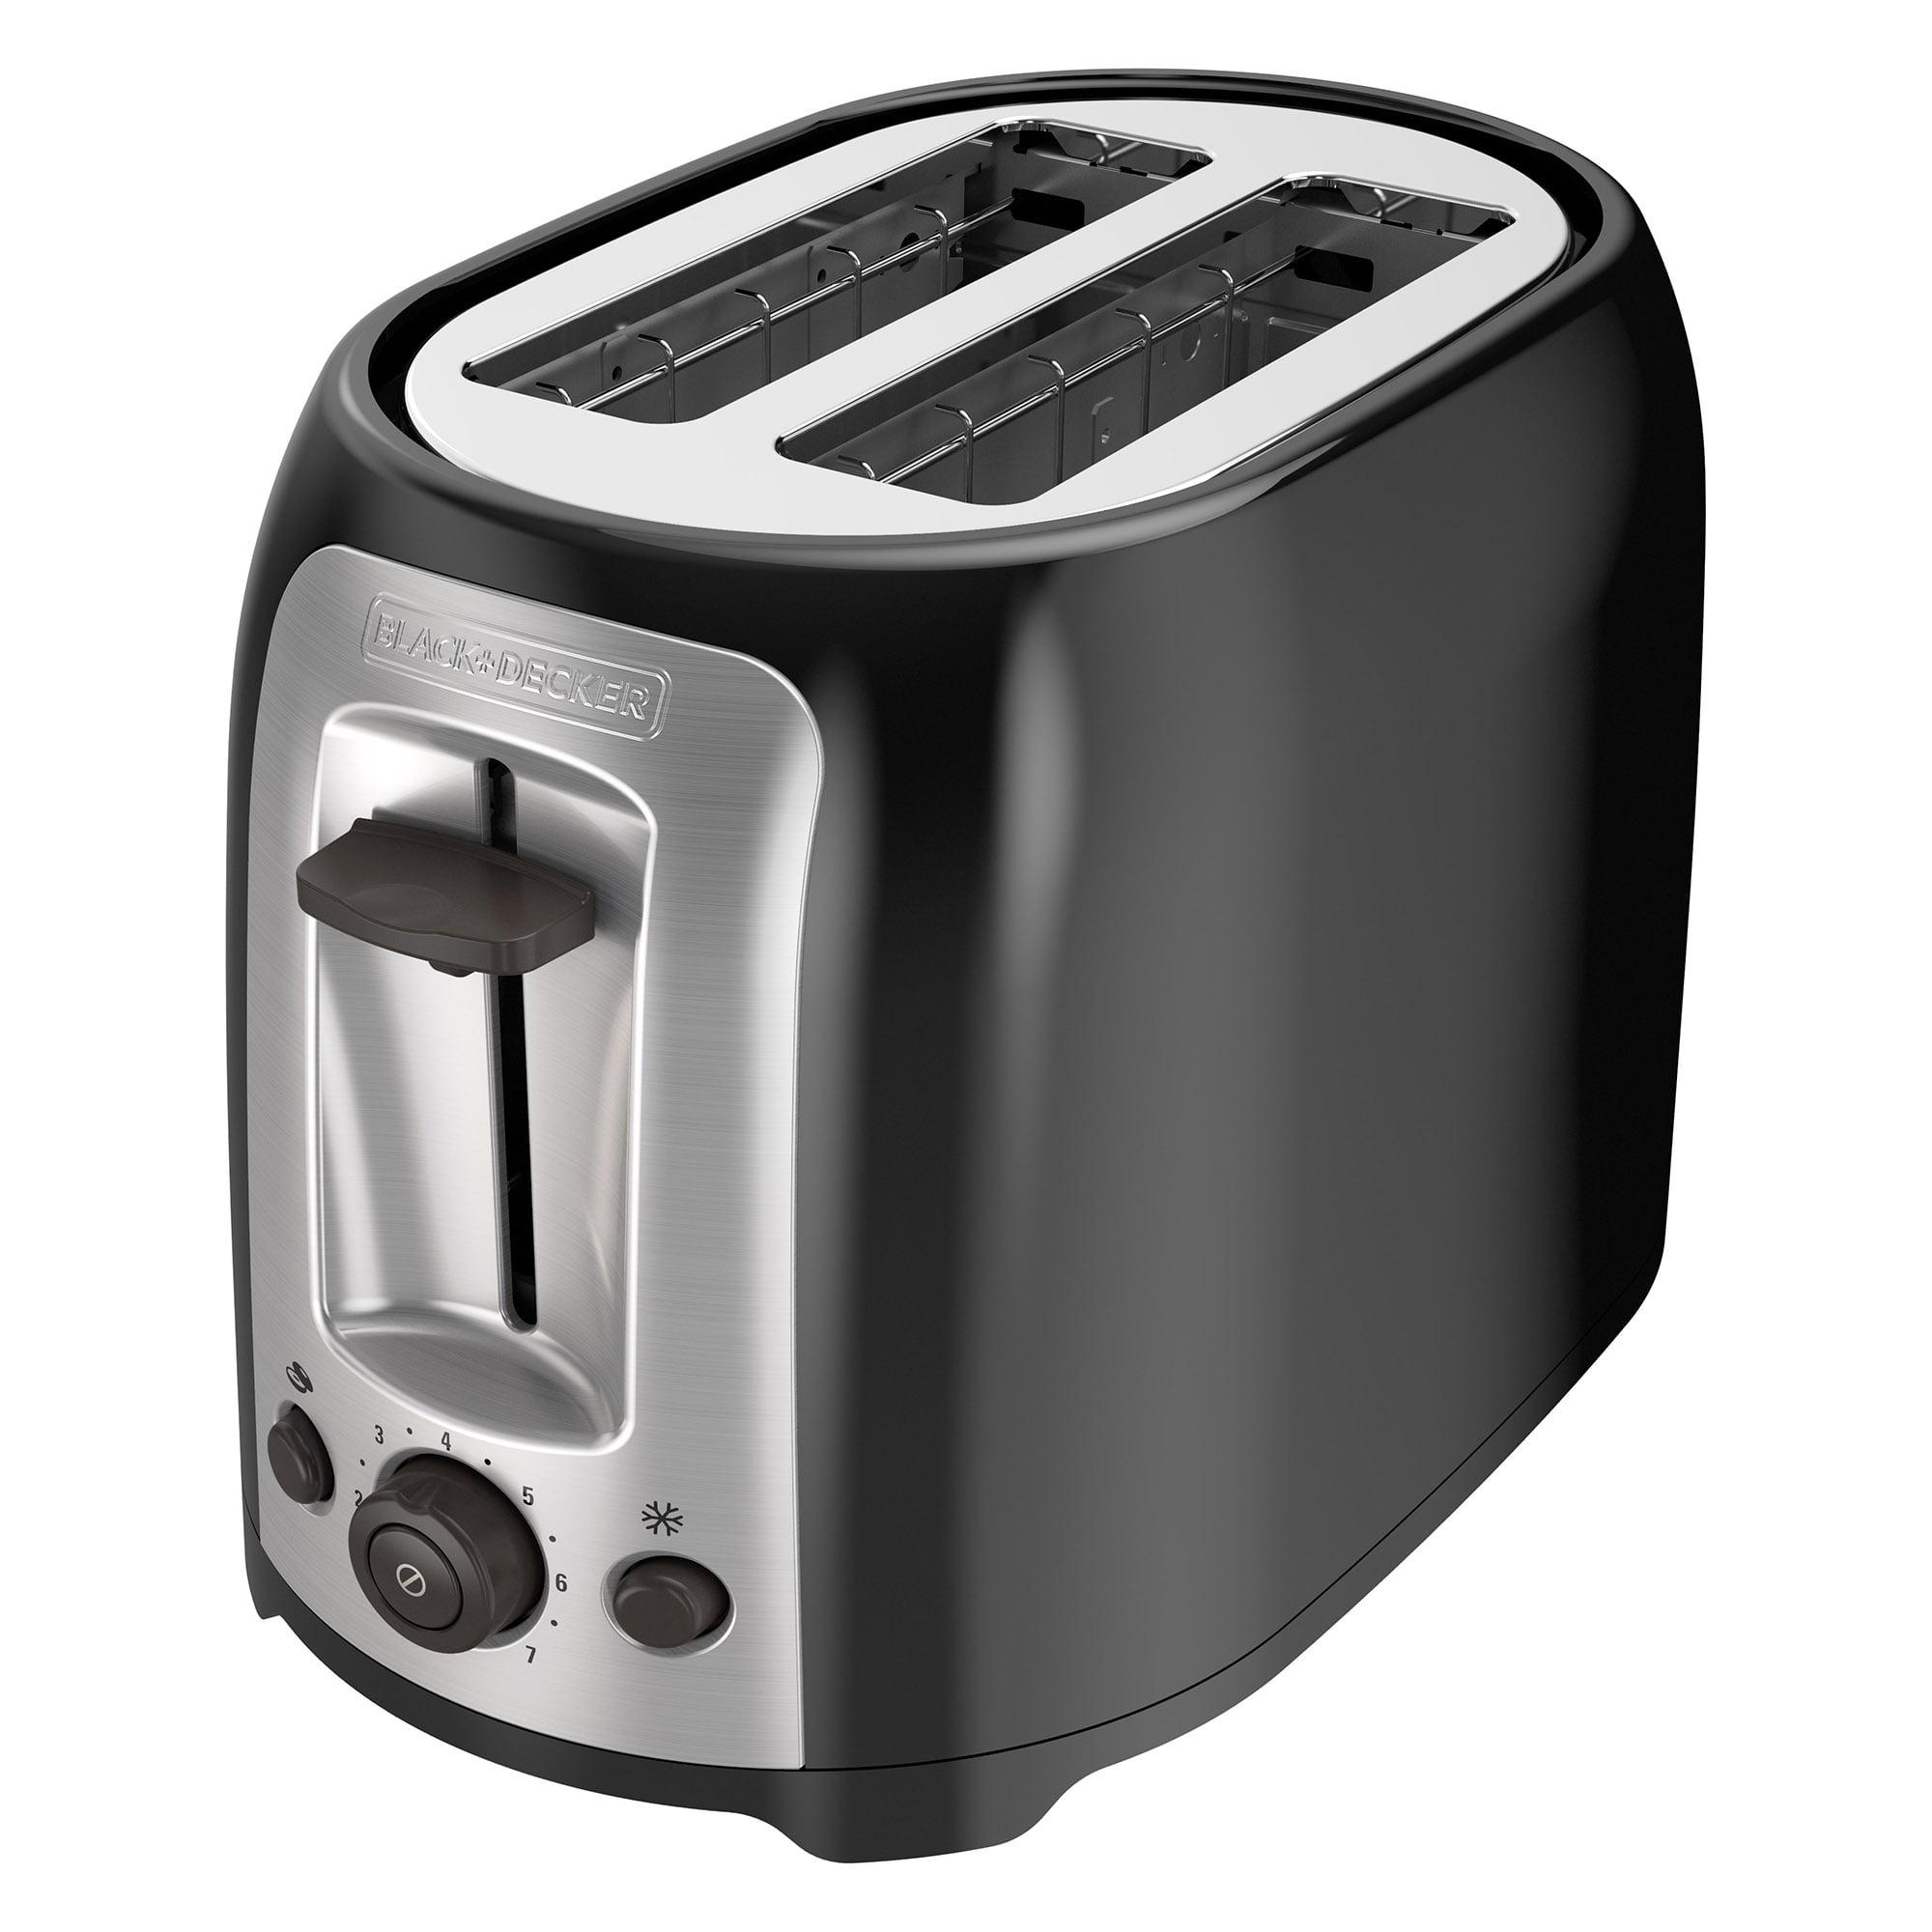 Black & Decker 2-Slice Multi-Functional Toaster, Bagel Toaster, TR1278TRM by Black Decker